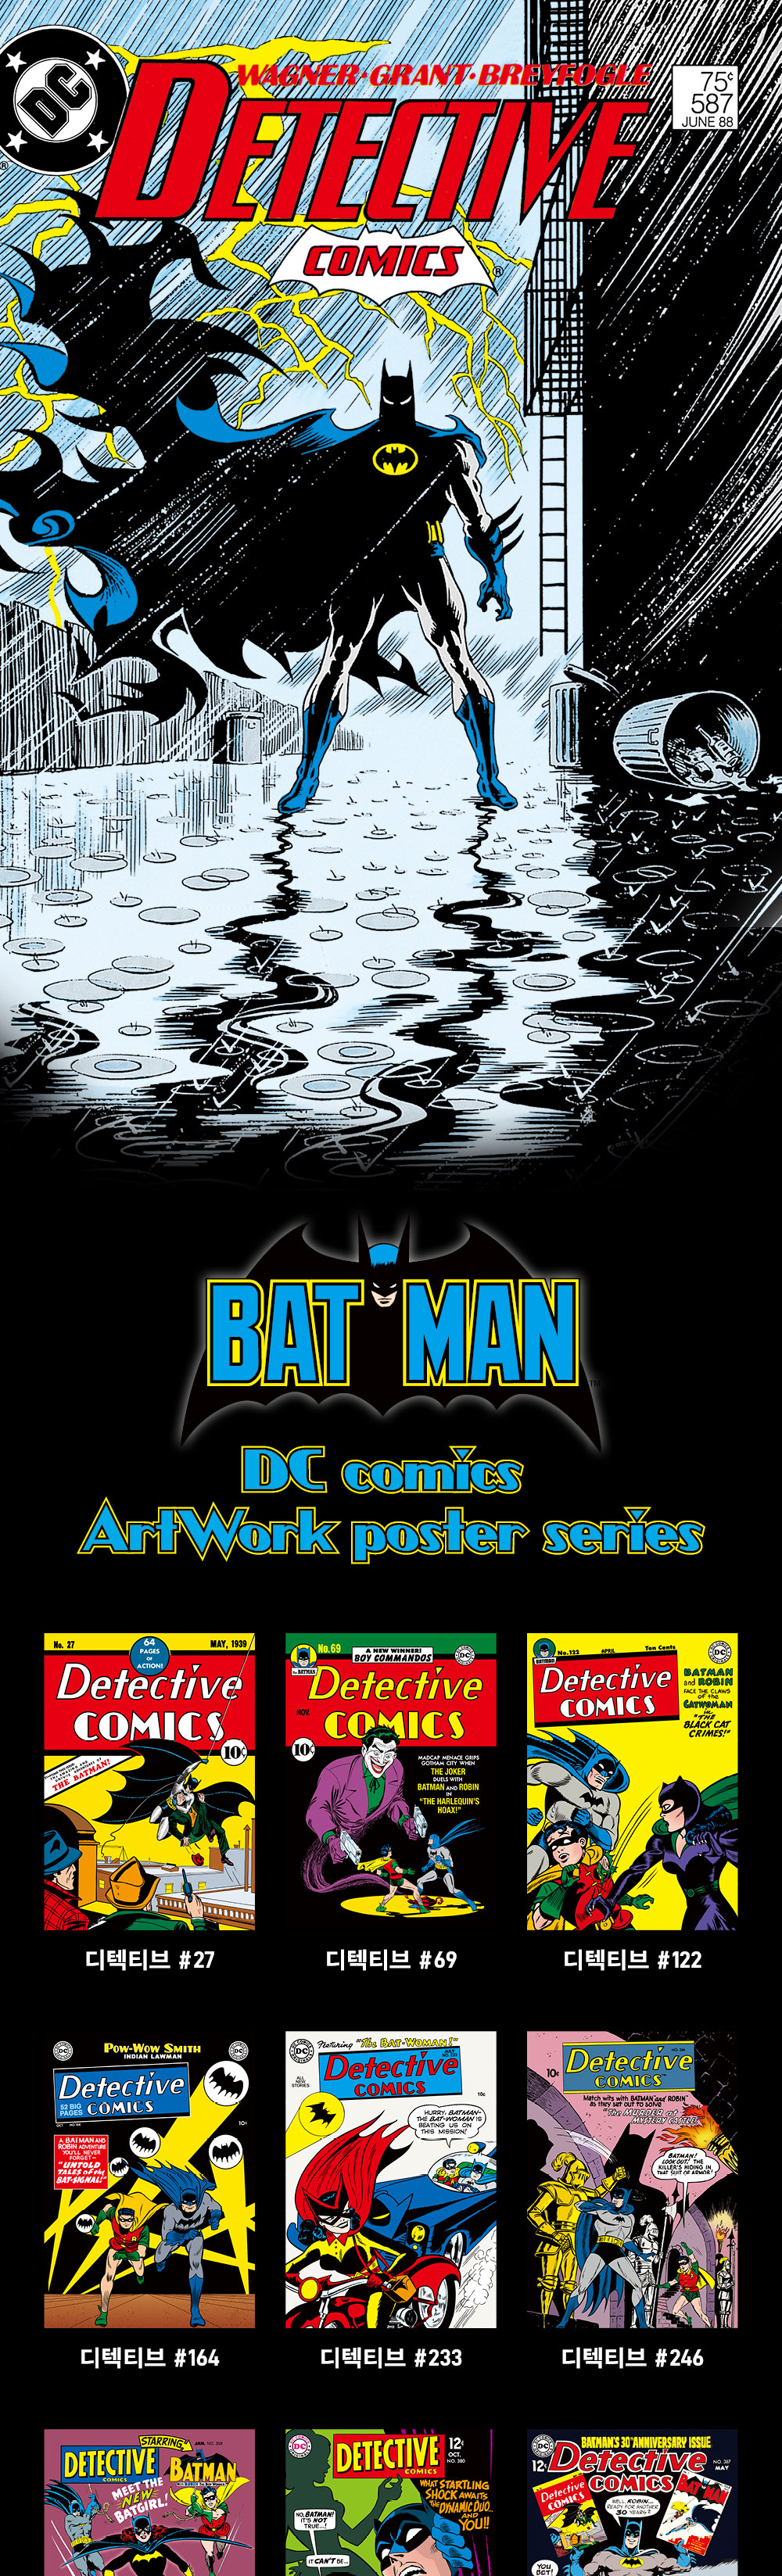 DC코믹스 인테리어 포스터_배트맨_01.jpg